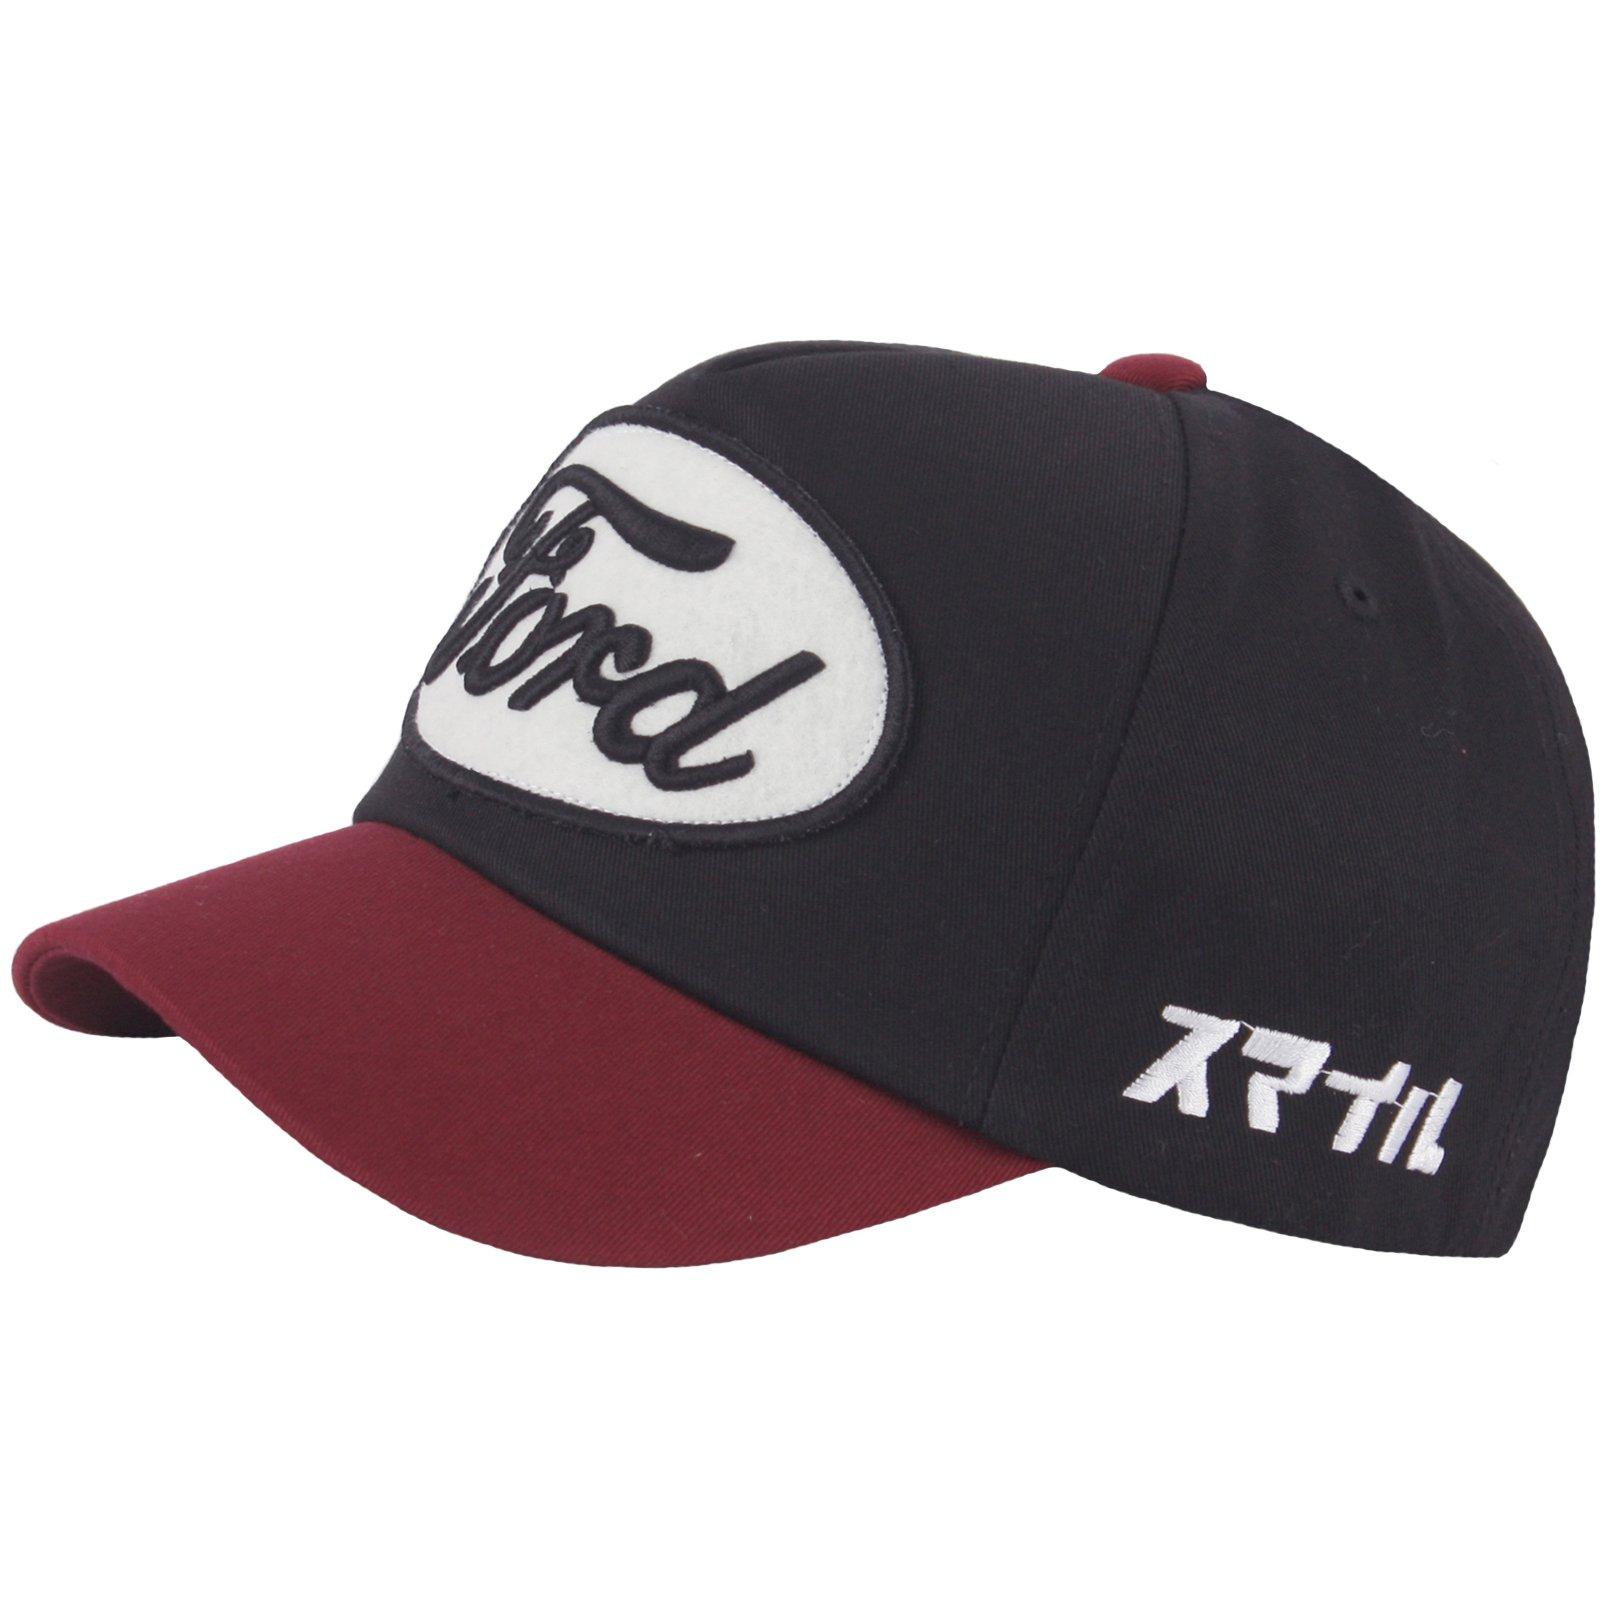 RaOn B318 Pre-curved Cool Short Bill Design Club Cute Ball Cap Baseball Hat Truckers (Wine)